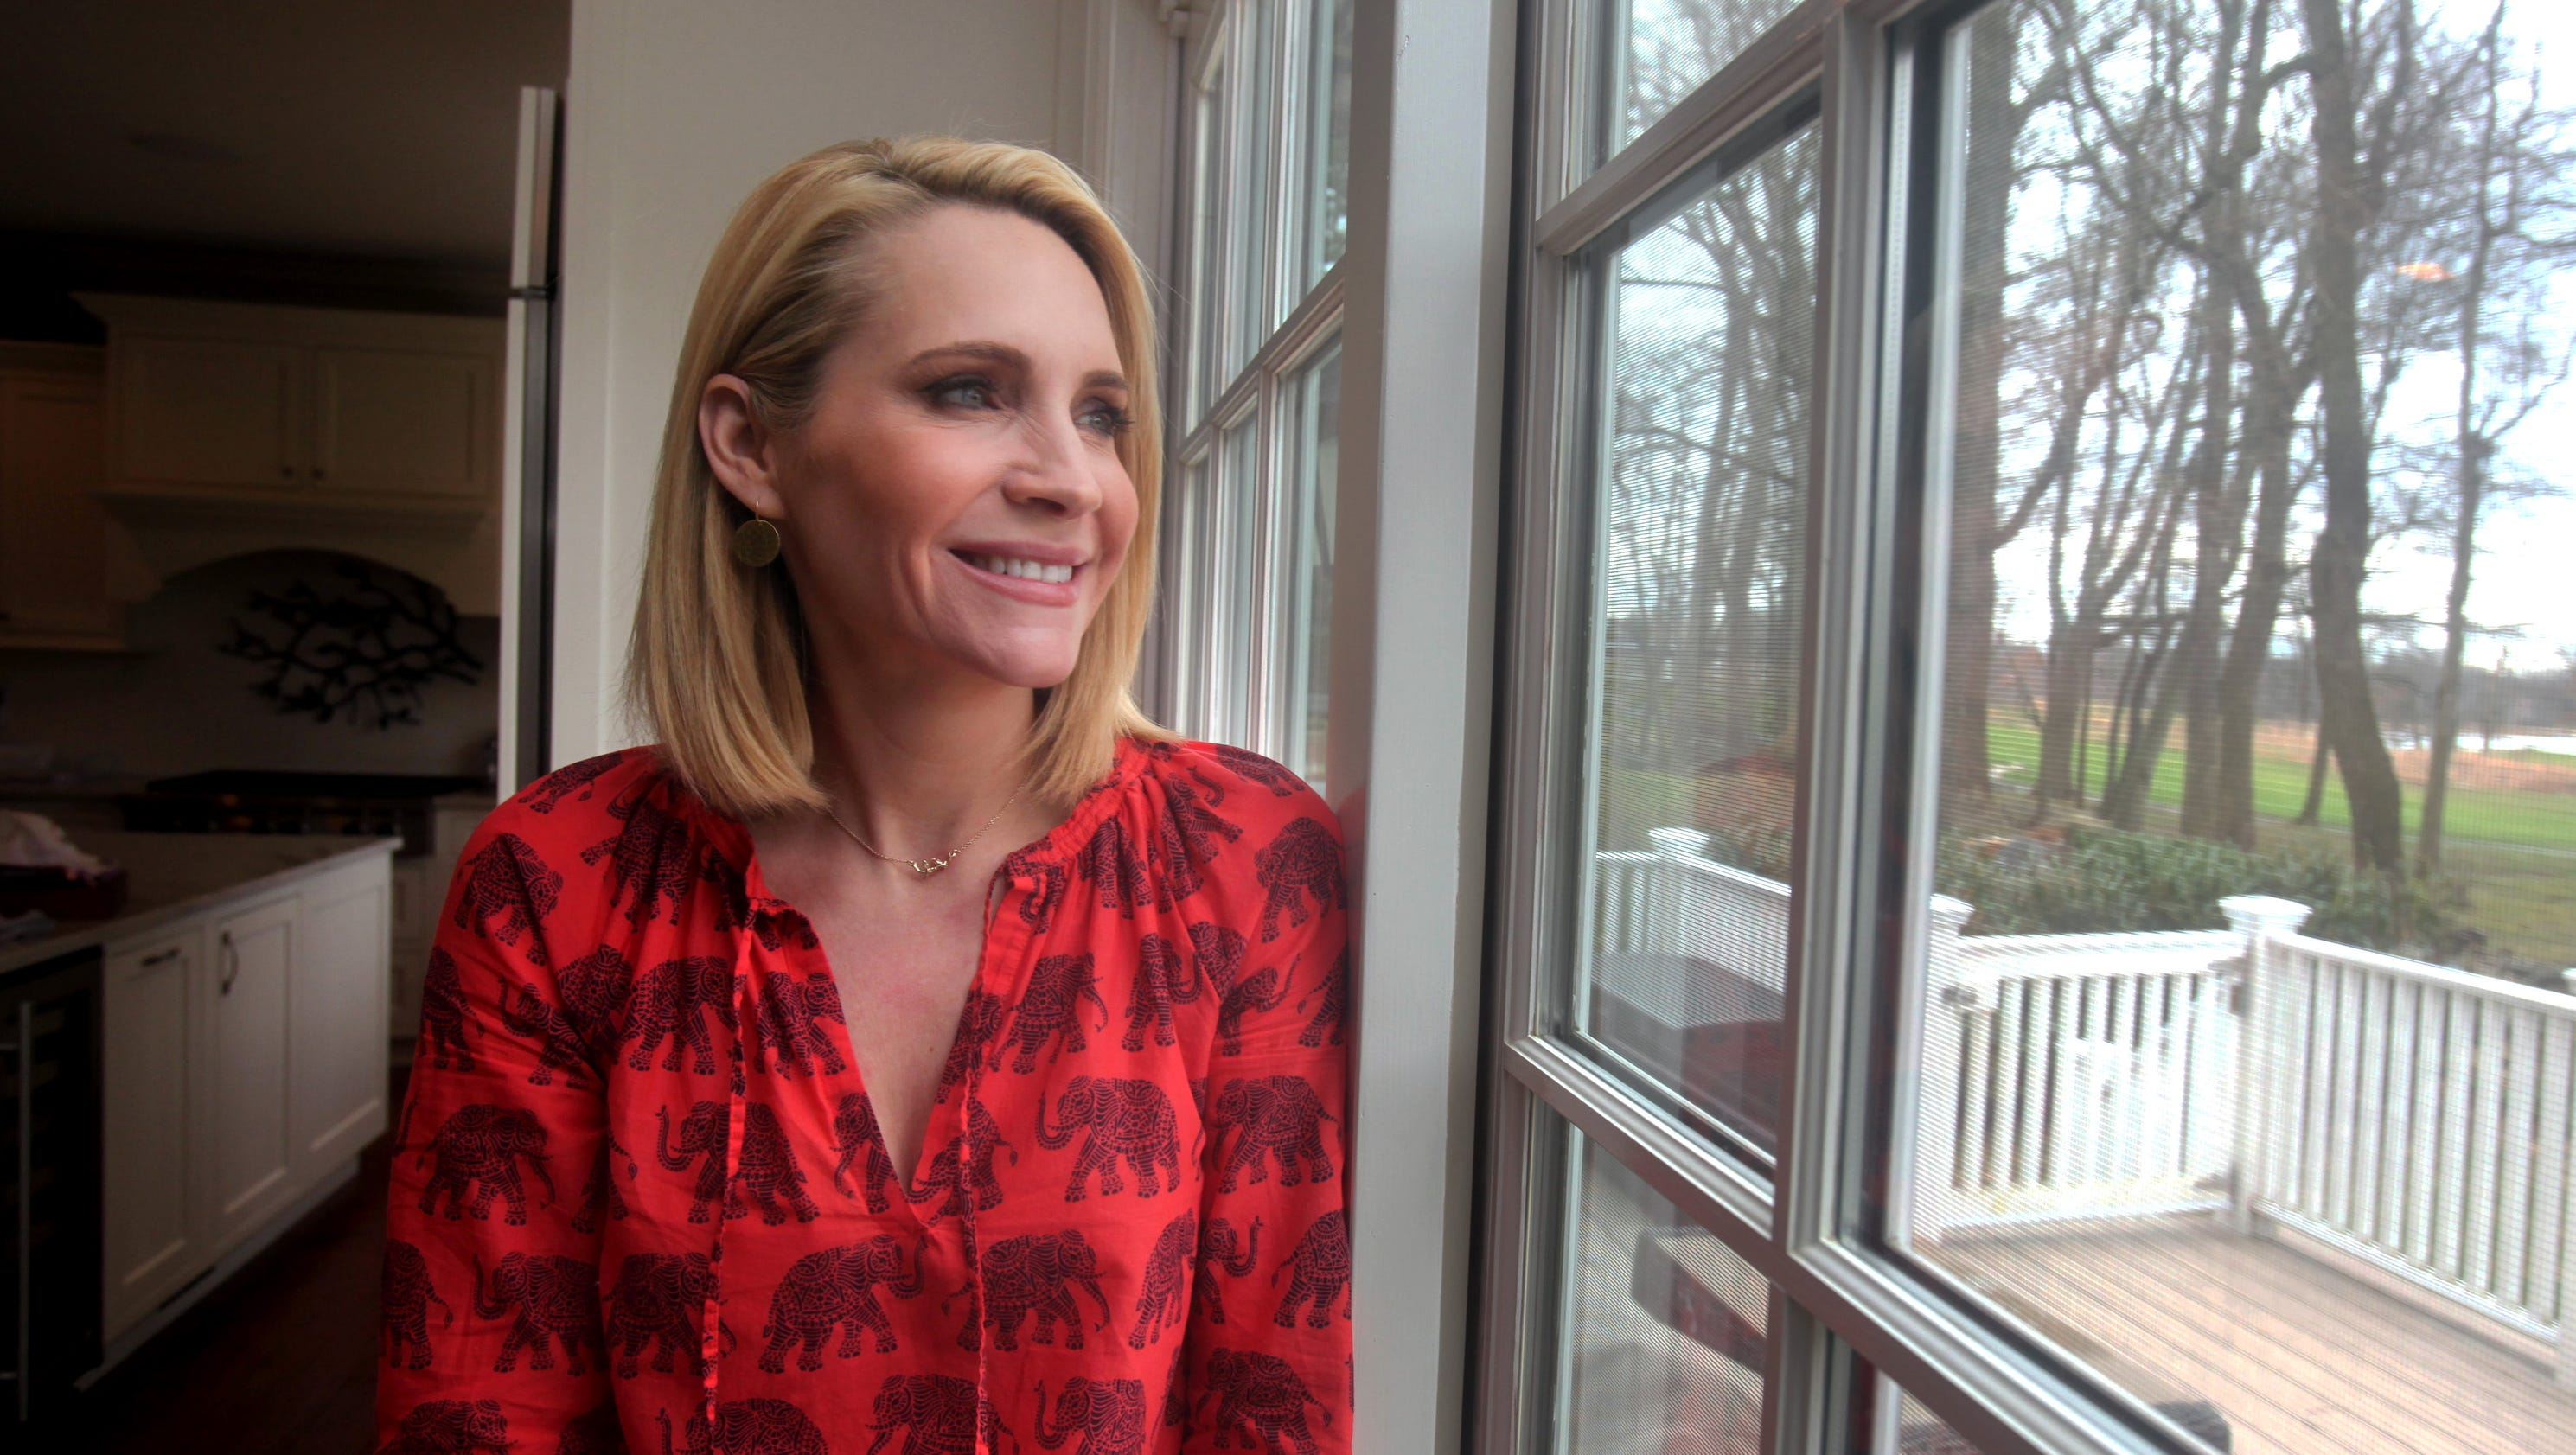 'Dateline NBC's' Andrea Canning balances family, career